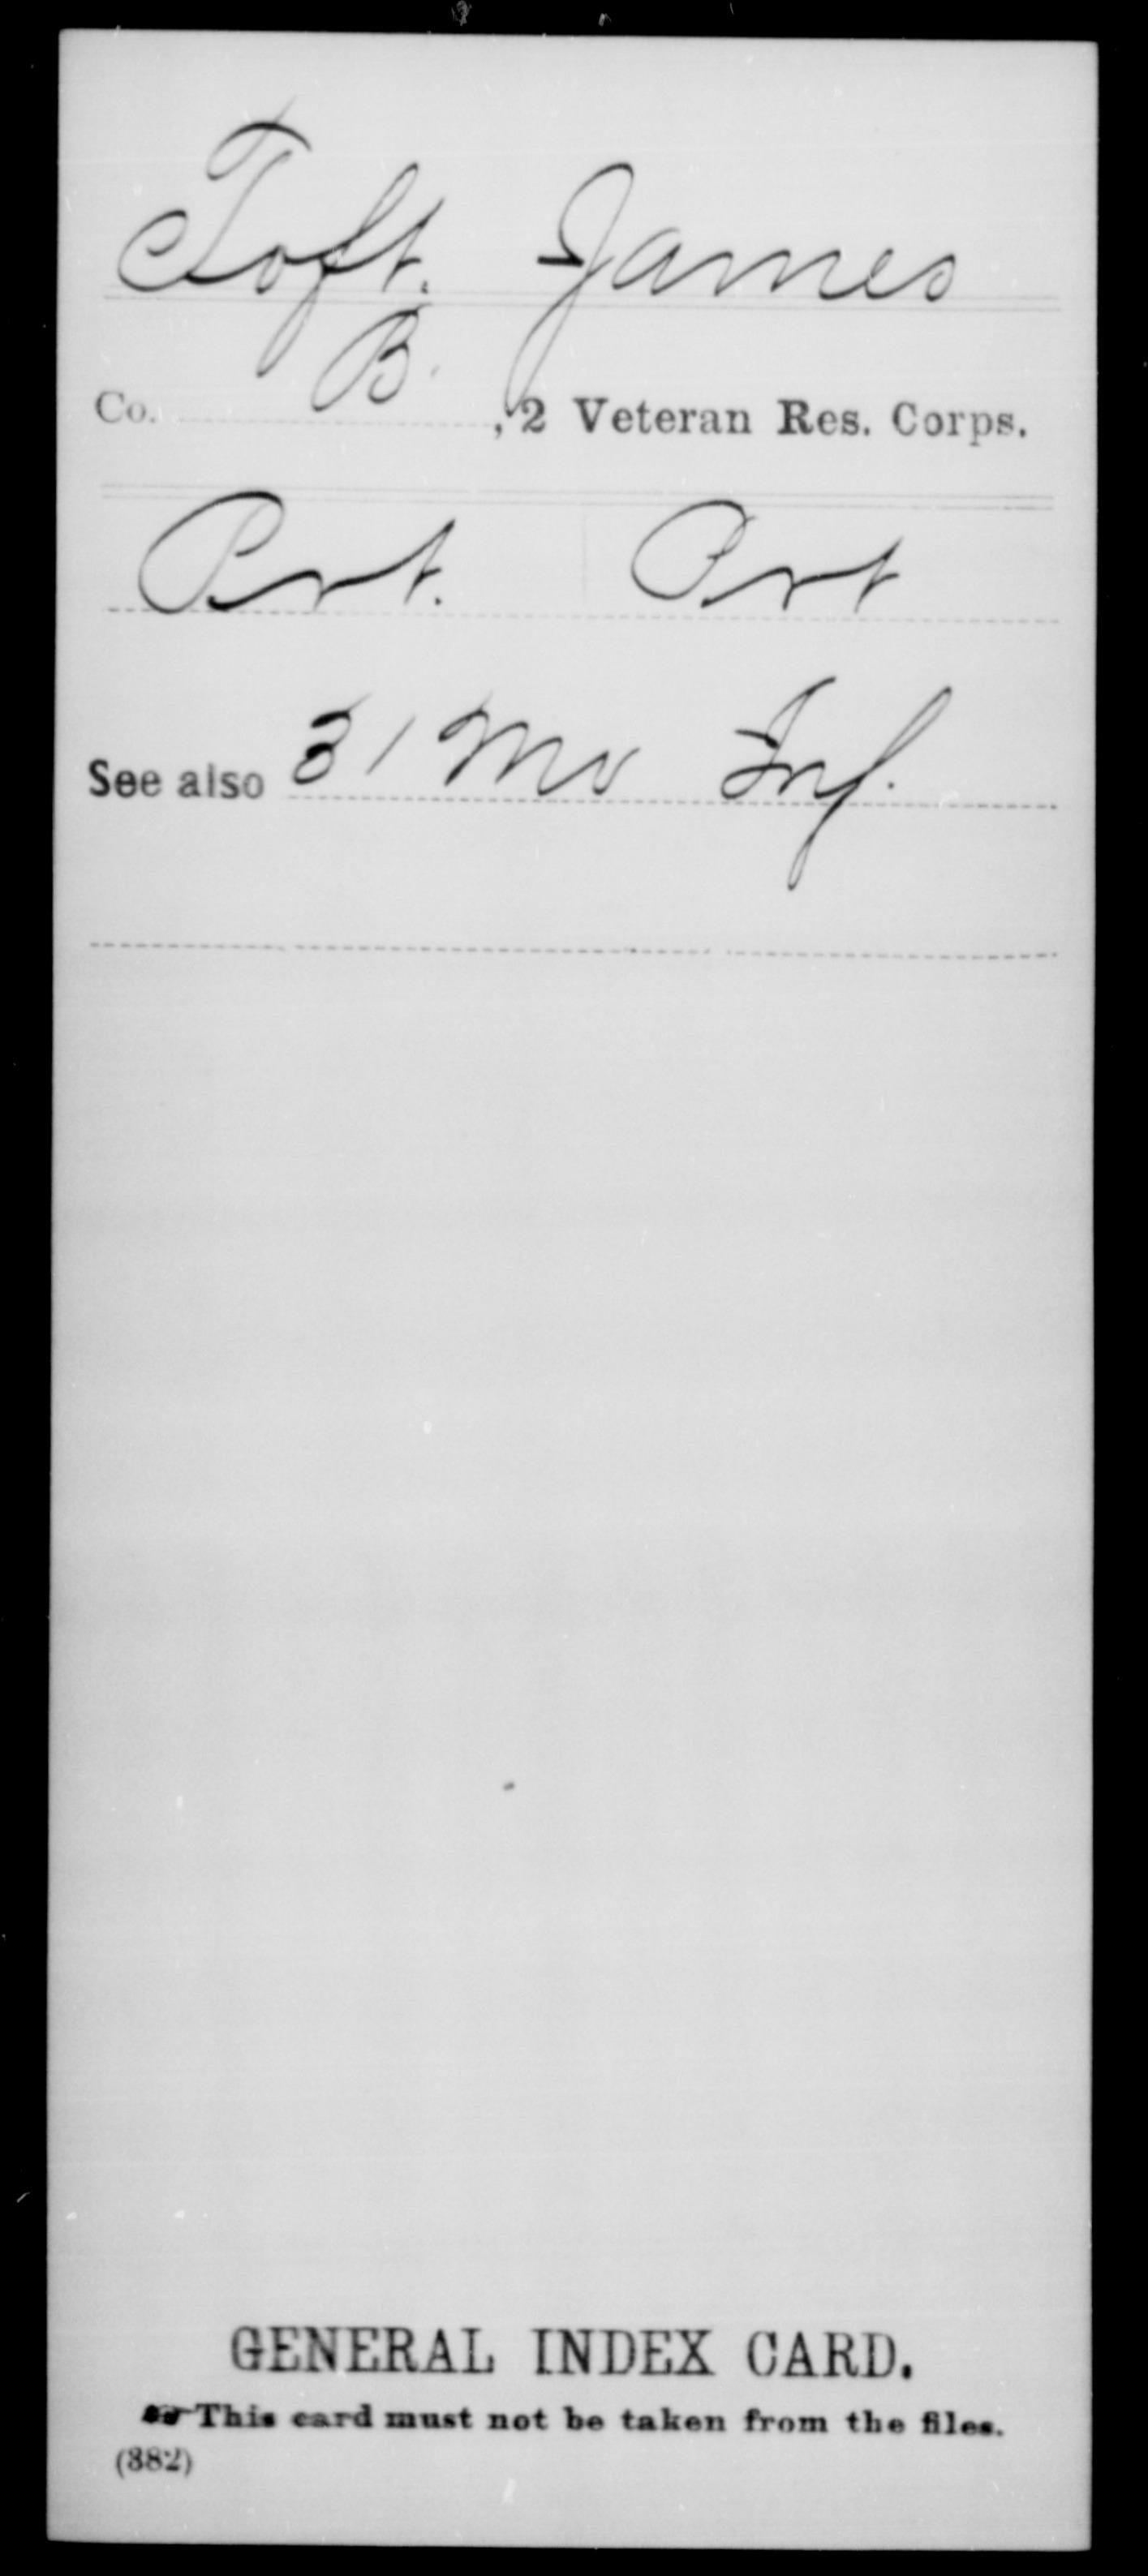 Toft, James - 2nd Veteran Reserve Corps, Company B